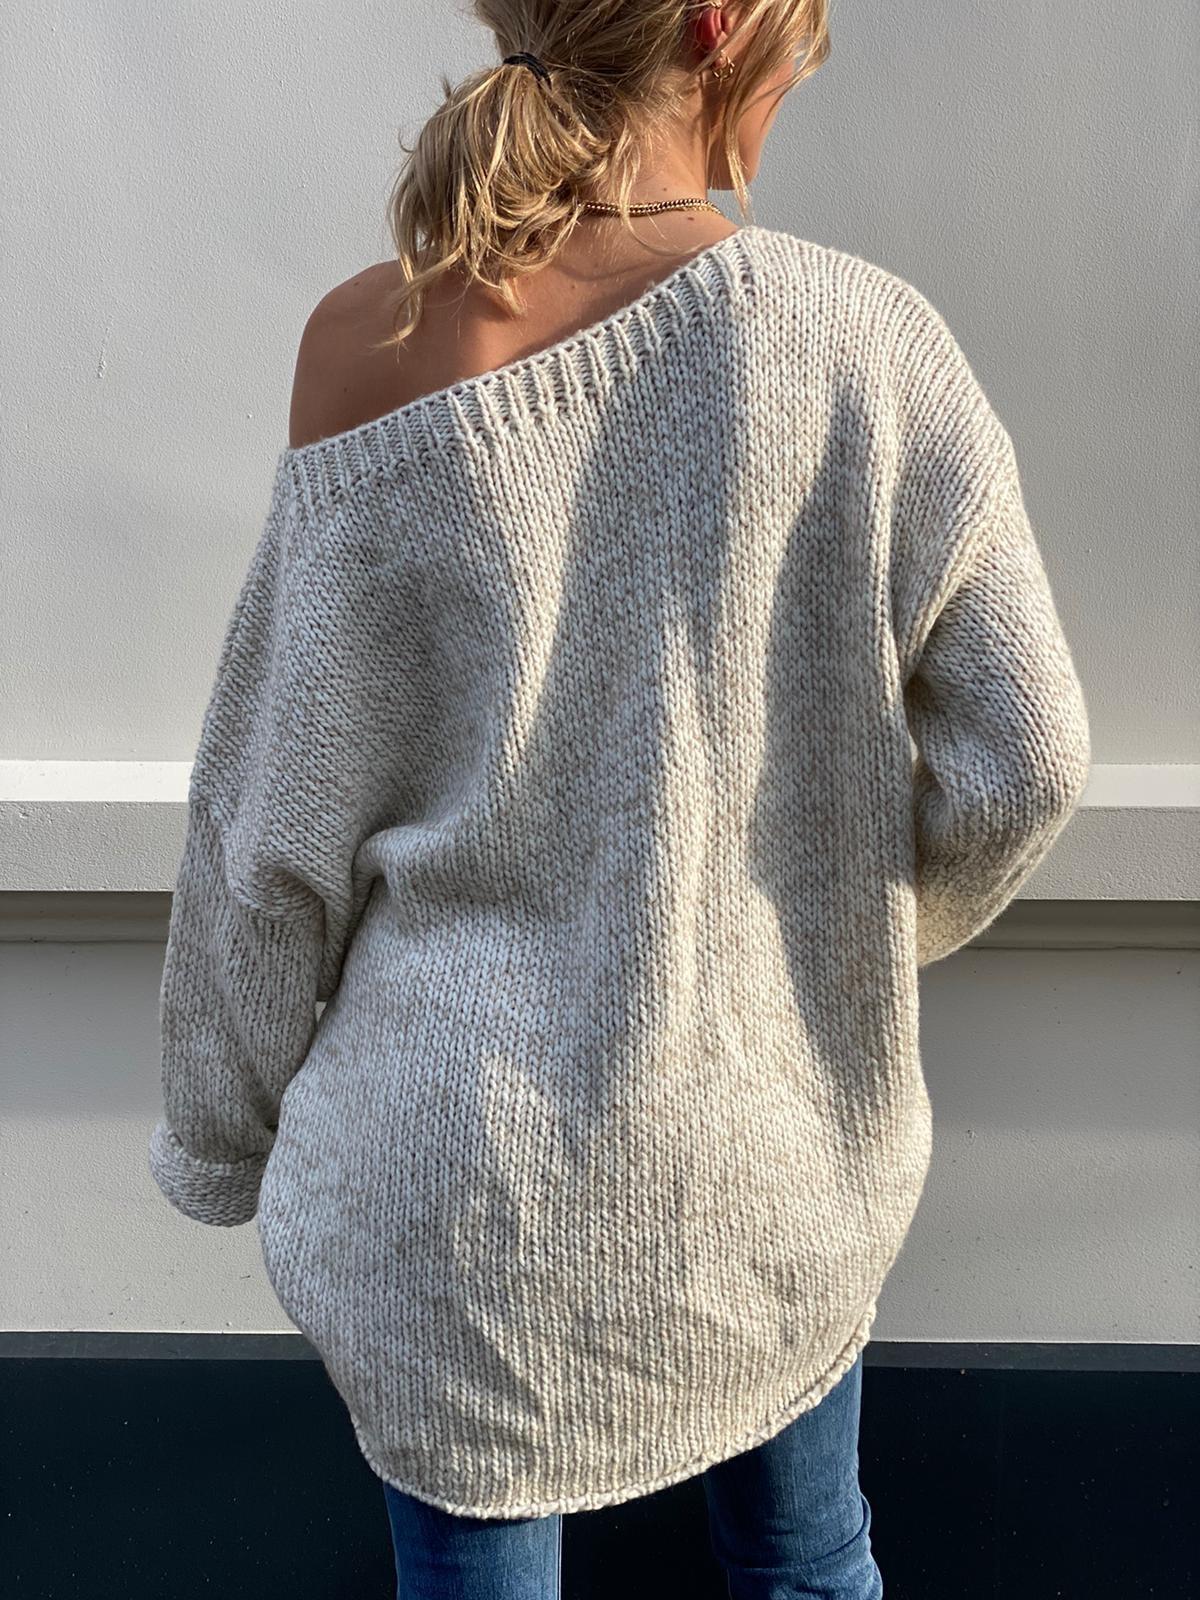 2037 Dins Tricot Sweater Short Beige White